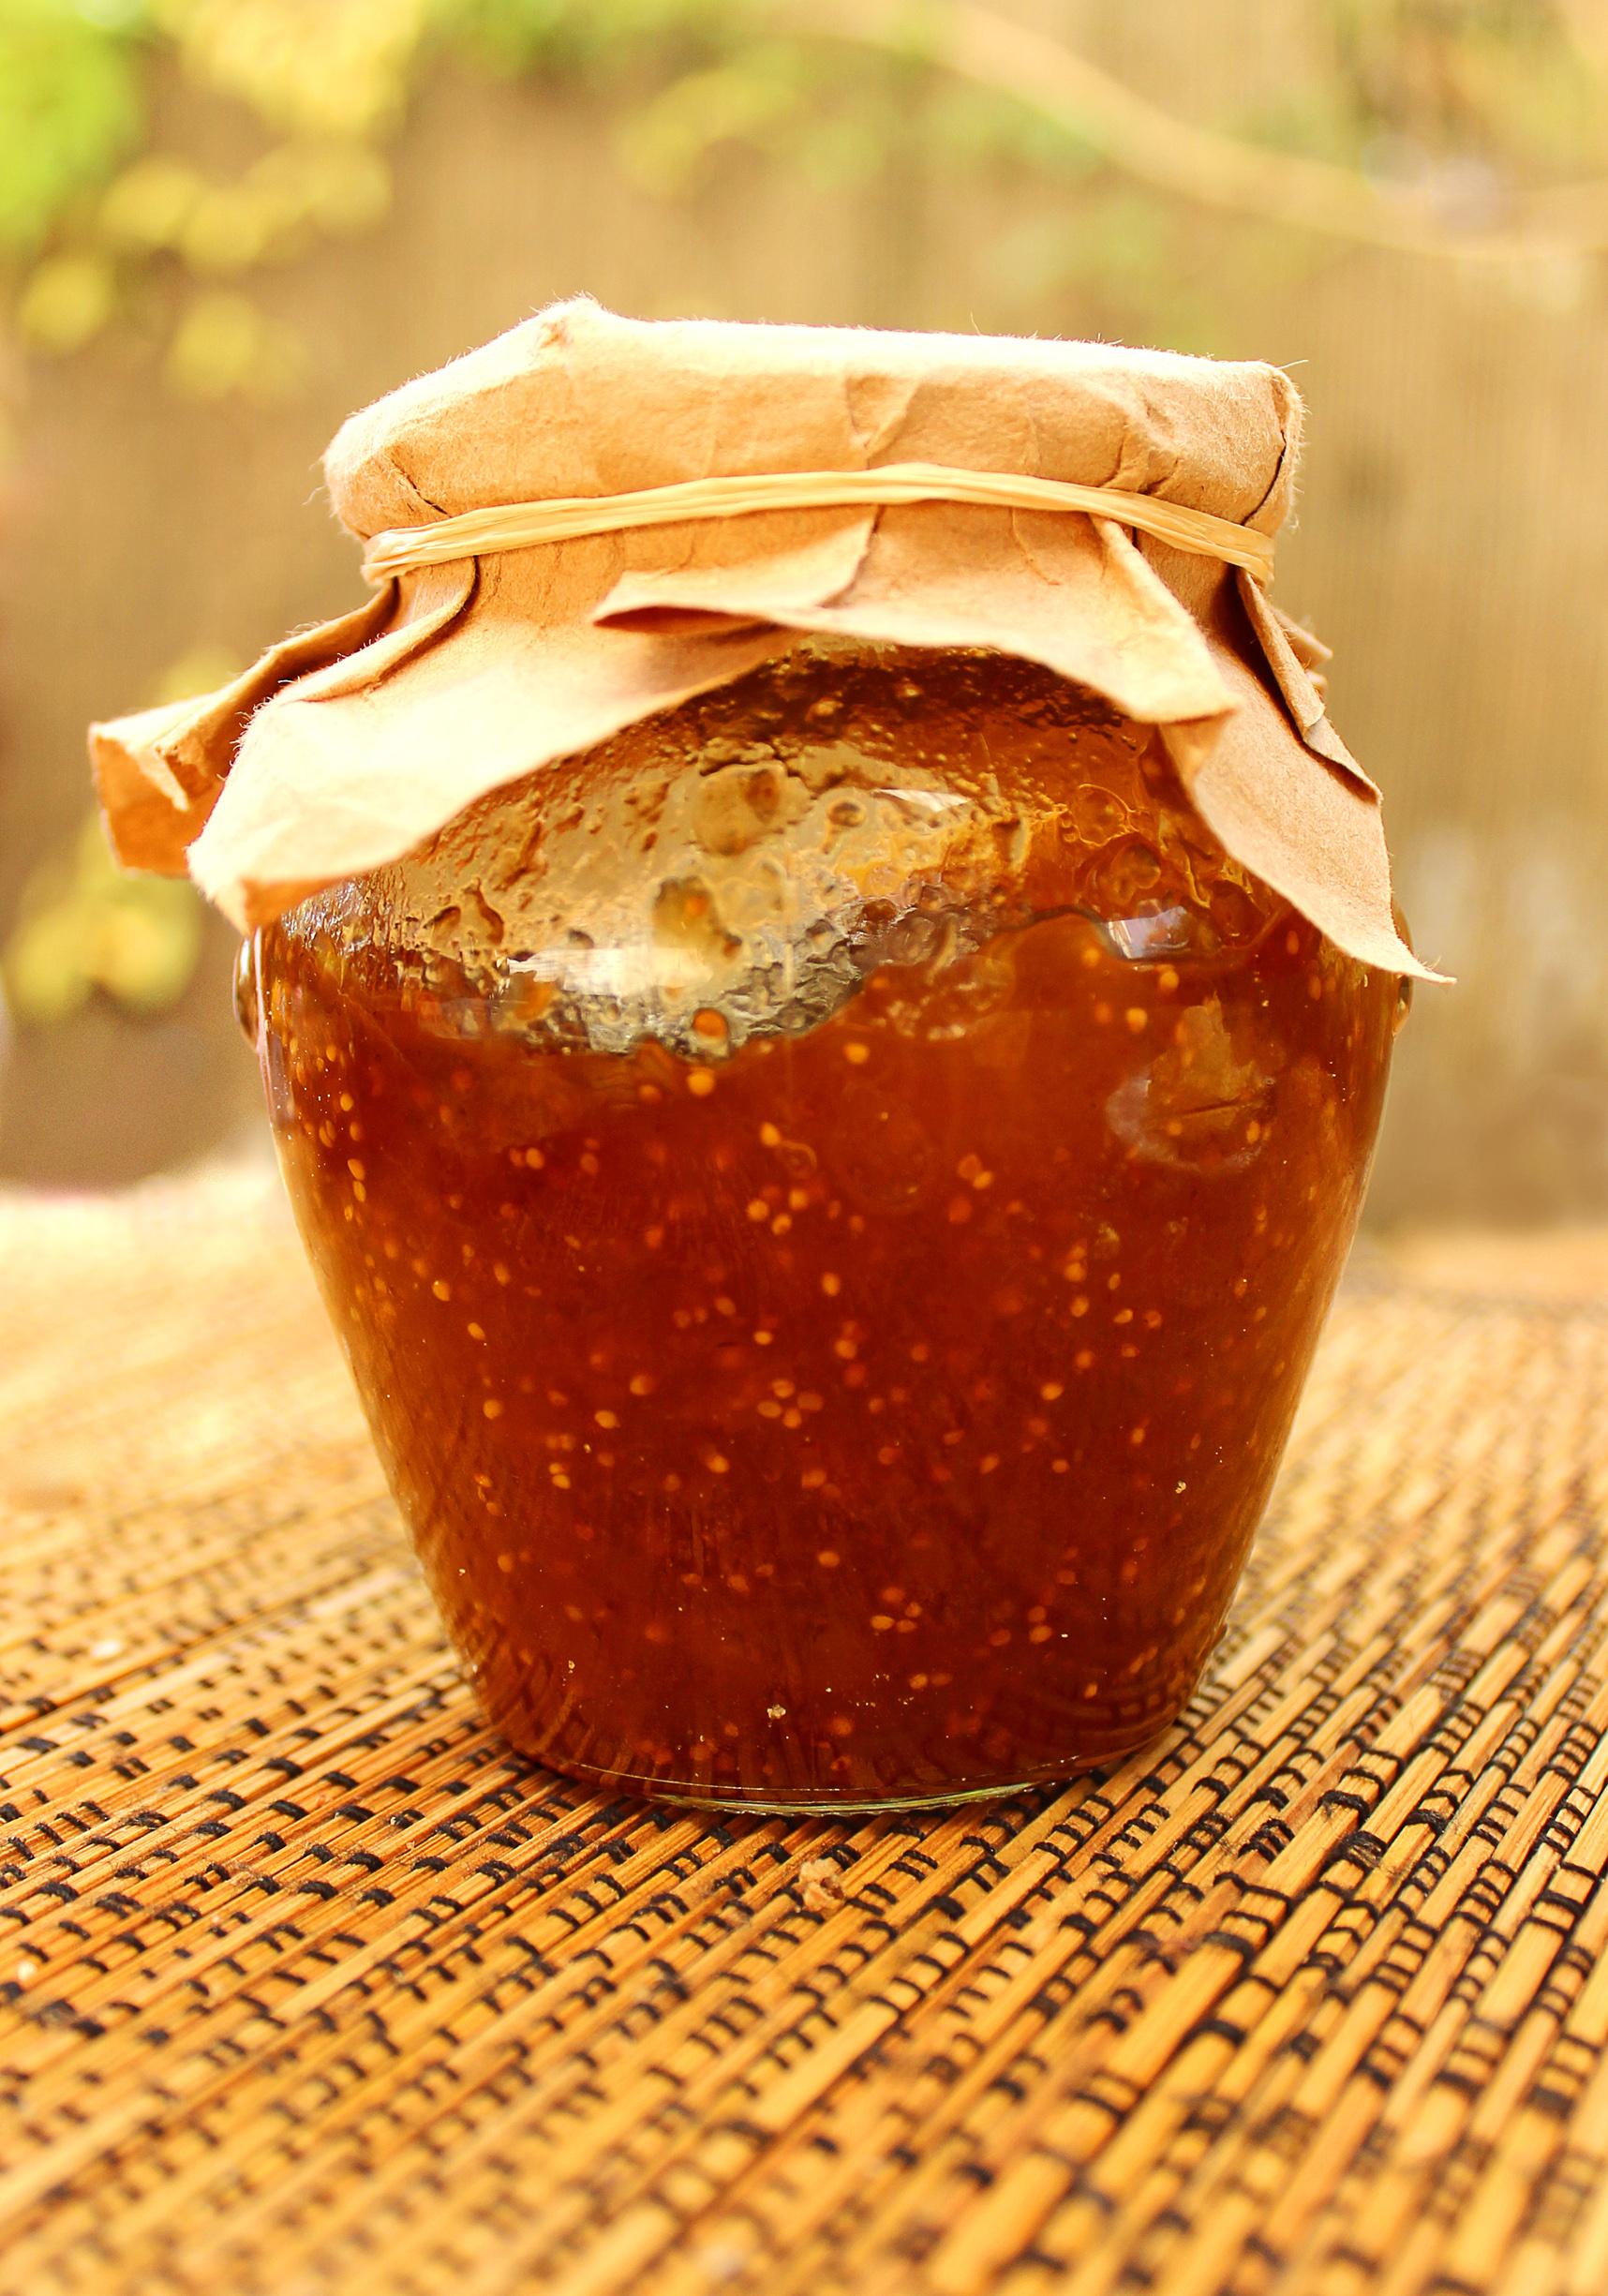 Homemade jam, Marmalade, Juicy, Jelly, Ingredient, HQ Photo